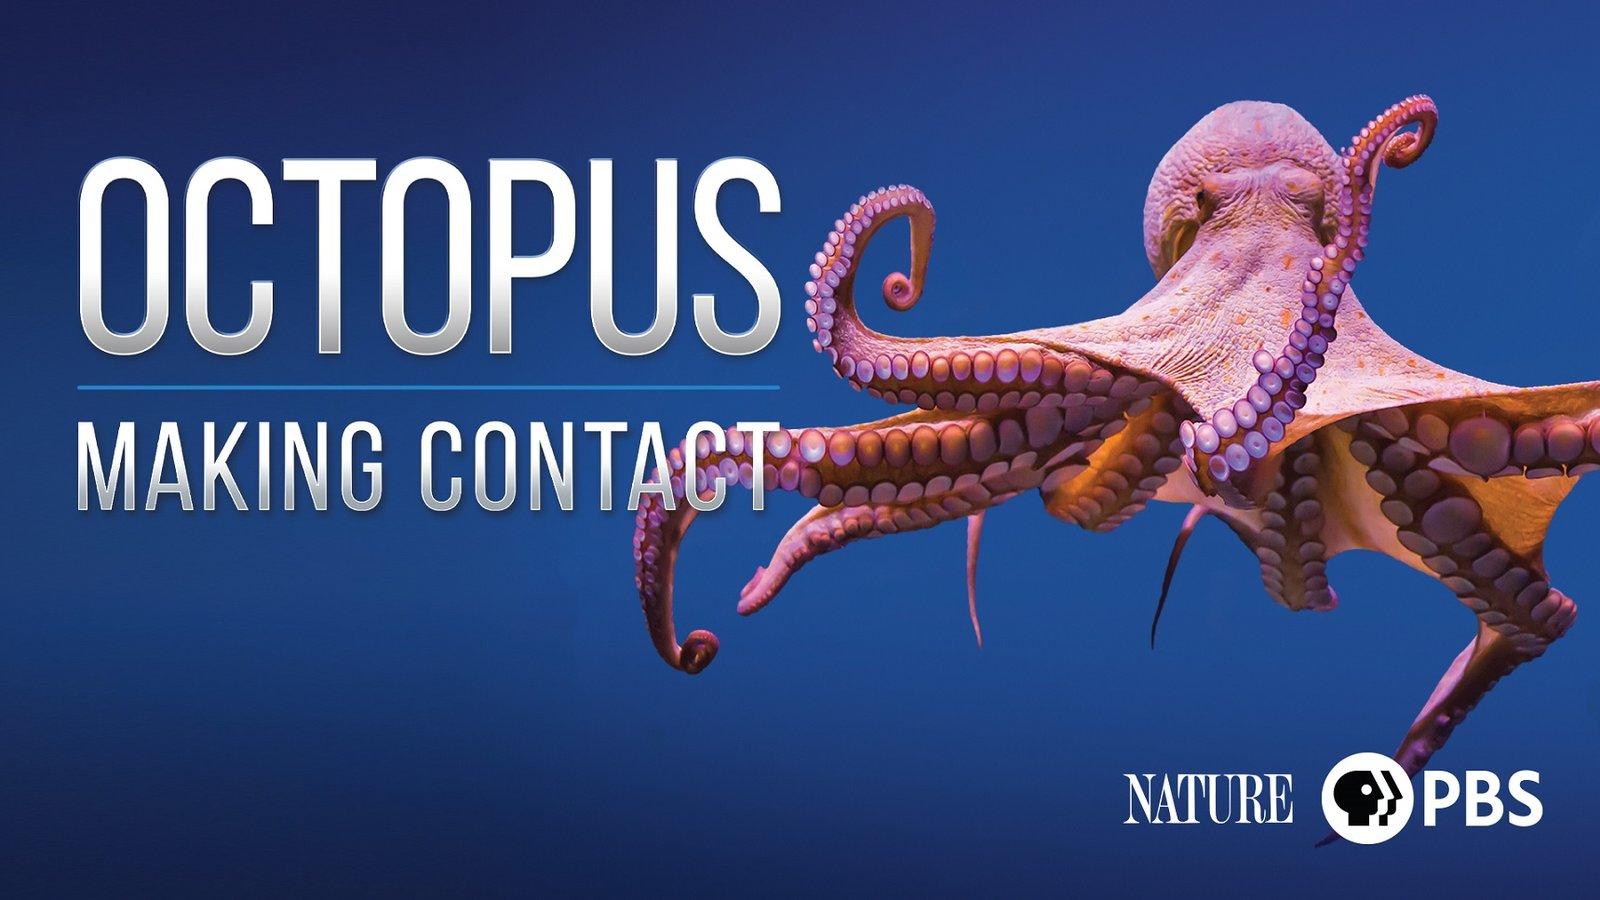 Nature: Octopus - Making Contact